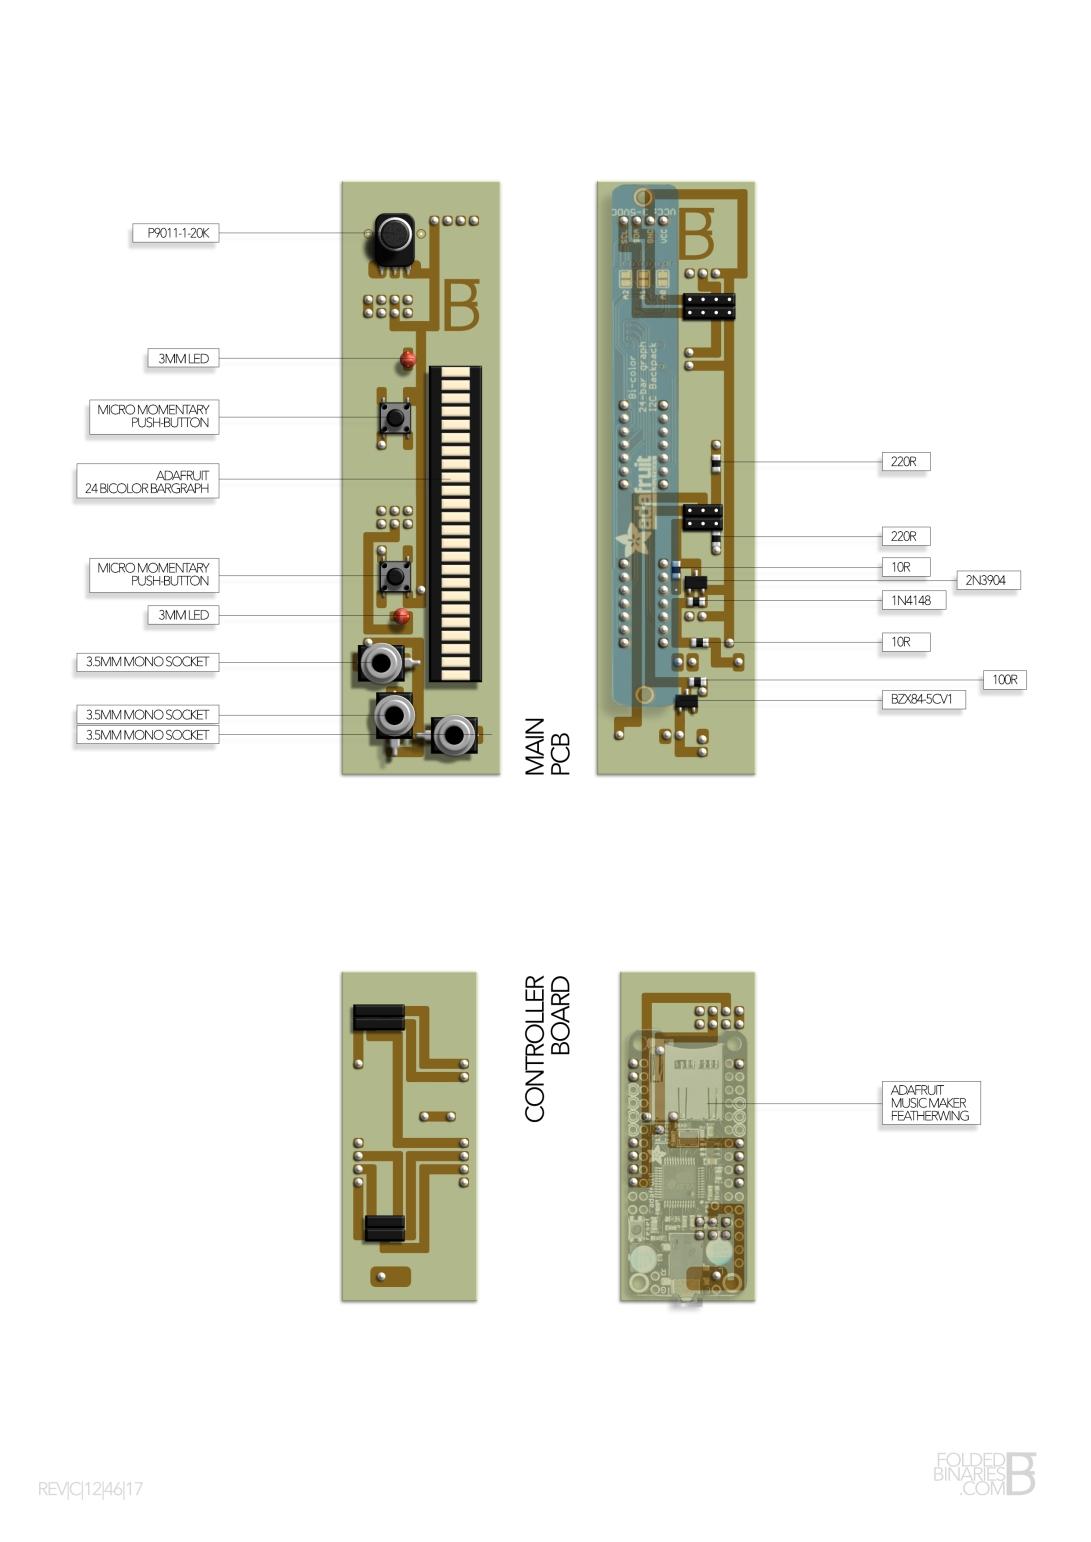 87ACB407-2DC0-4B52-A7A7-042C7F73C2D4.jpeg